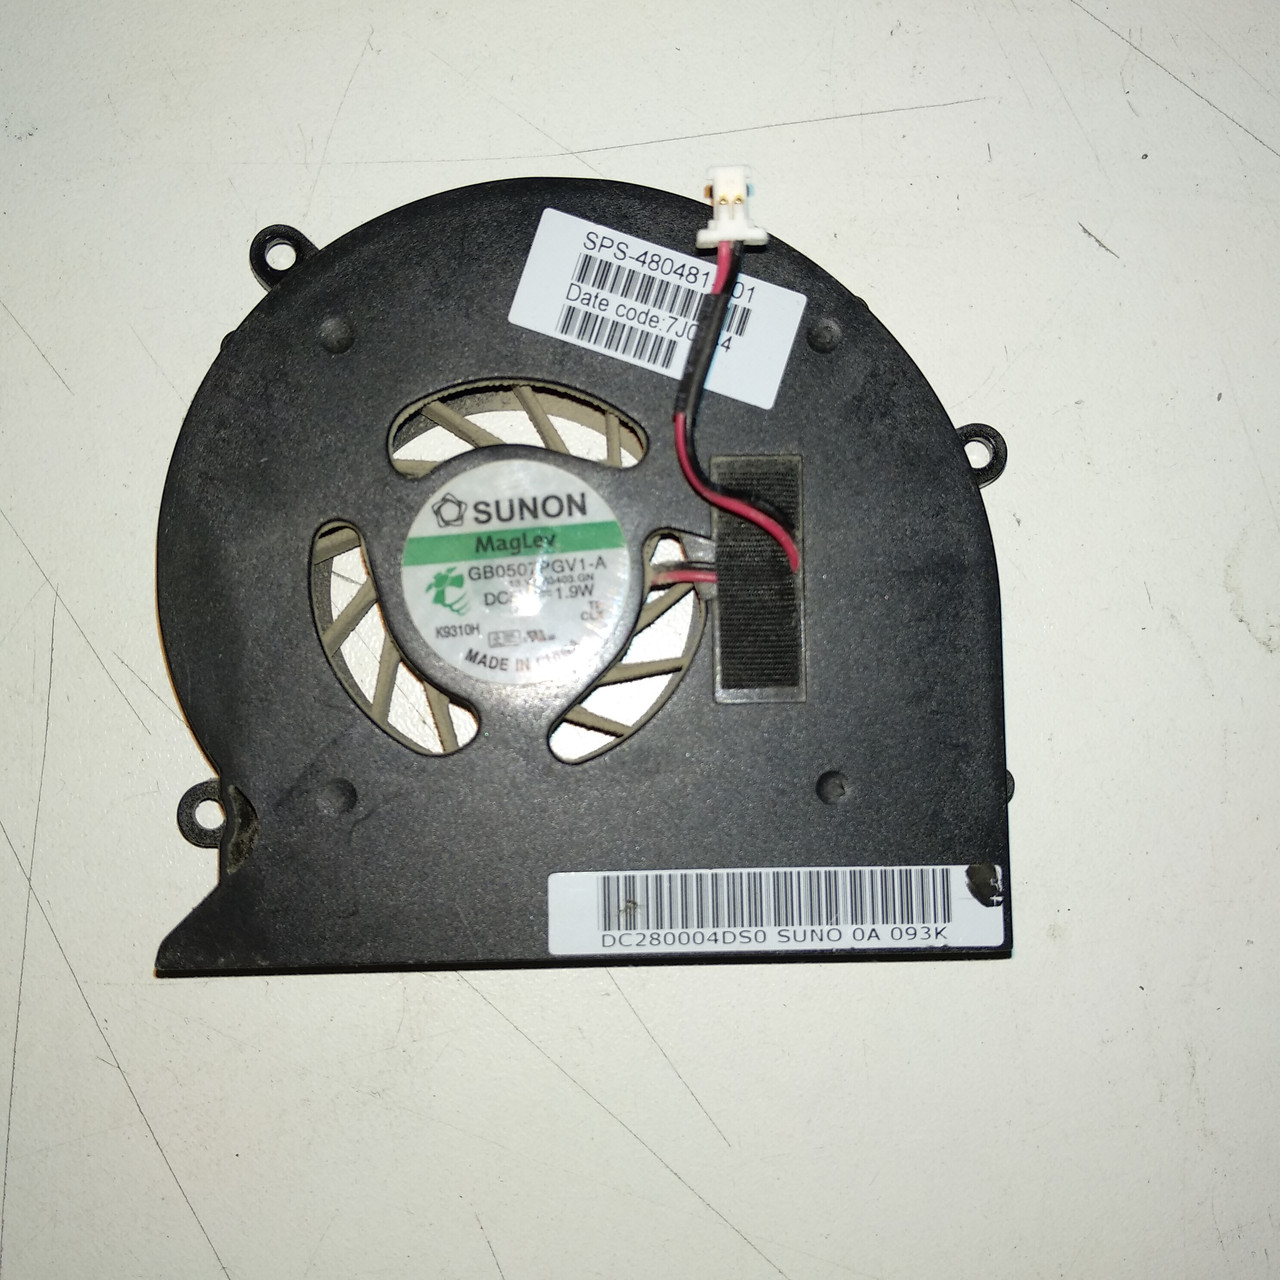 Кулер для ноутбука HP Pavilion dv7 1000(DC280004DS0)